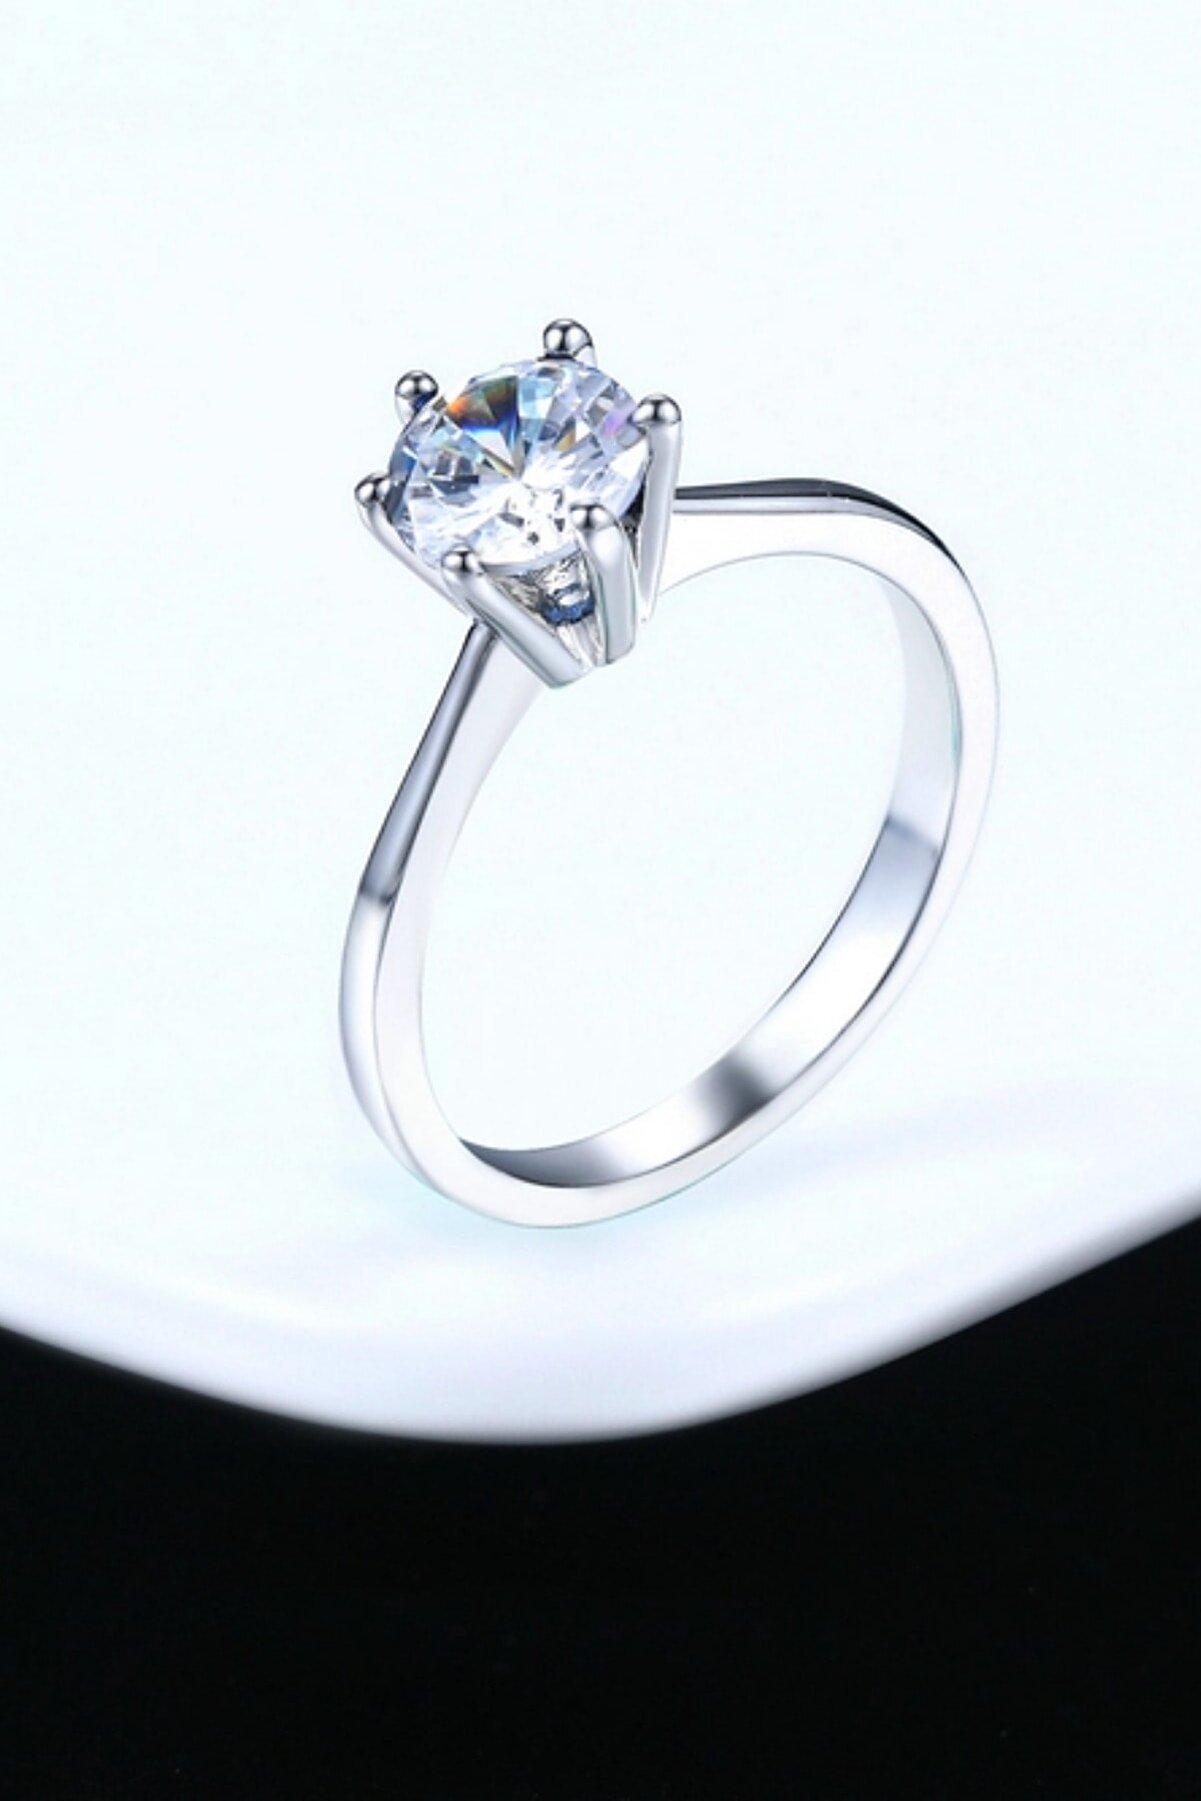 Crystal Diamond Zirconia Labaratuvar 0.50 Carat ,0.50 Karat Pırlanta Tektaş Yüzük